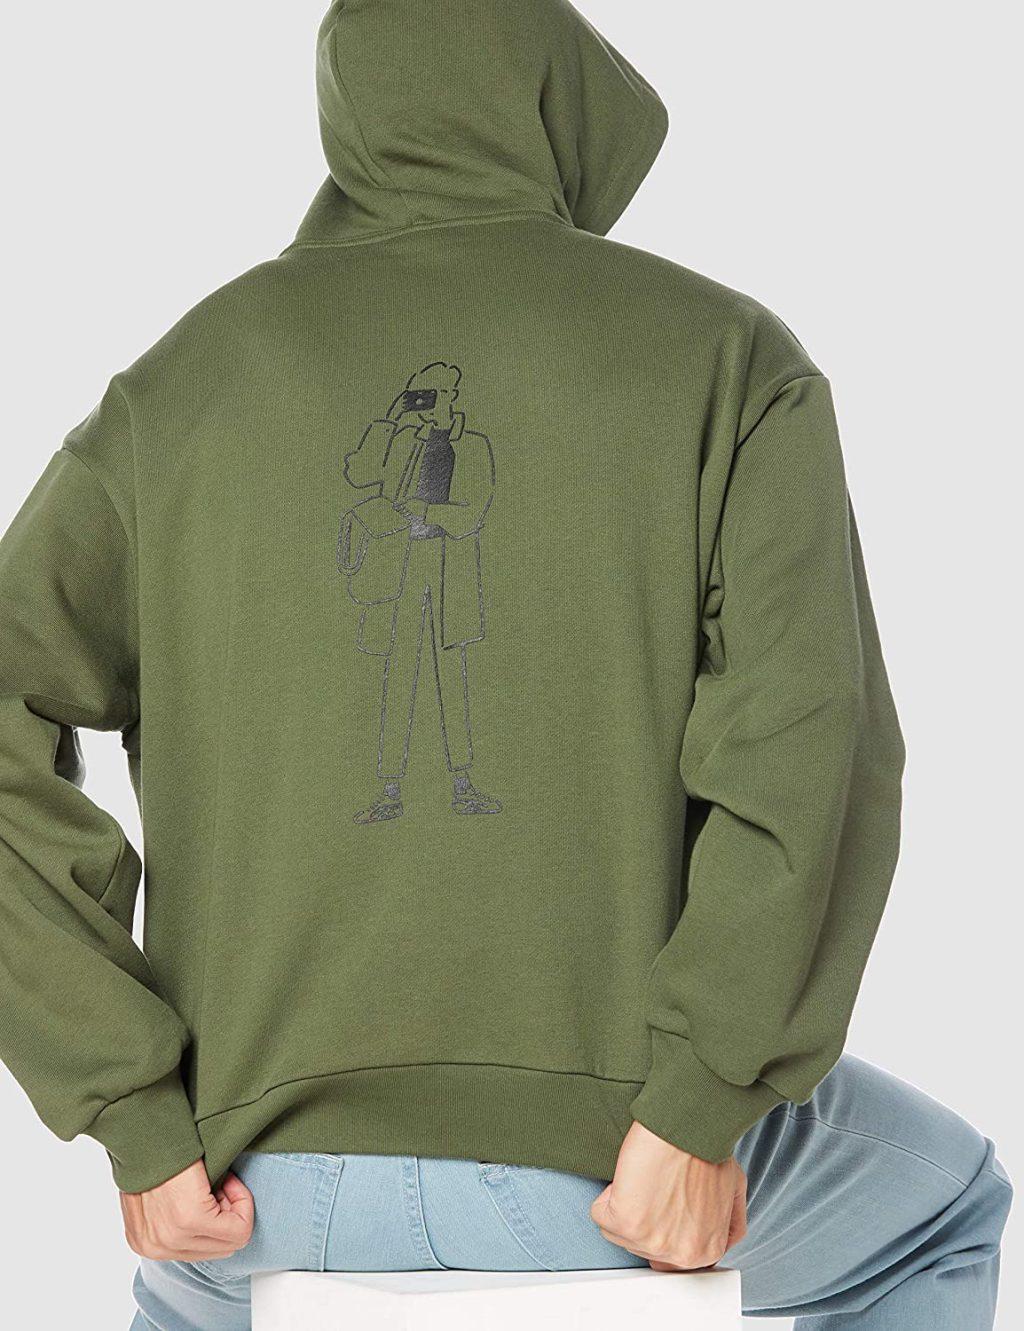 yu-nagaba-asics-collaboration-apparel-release-20200904